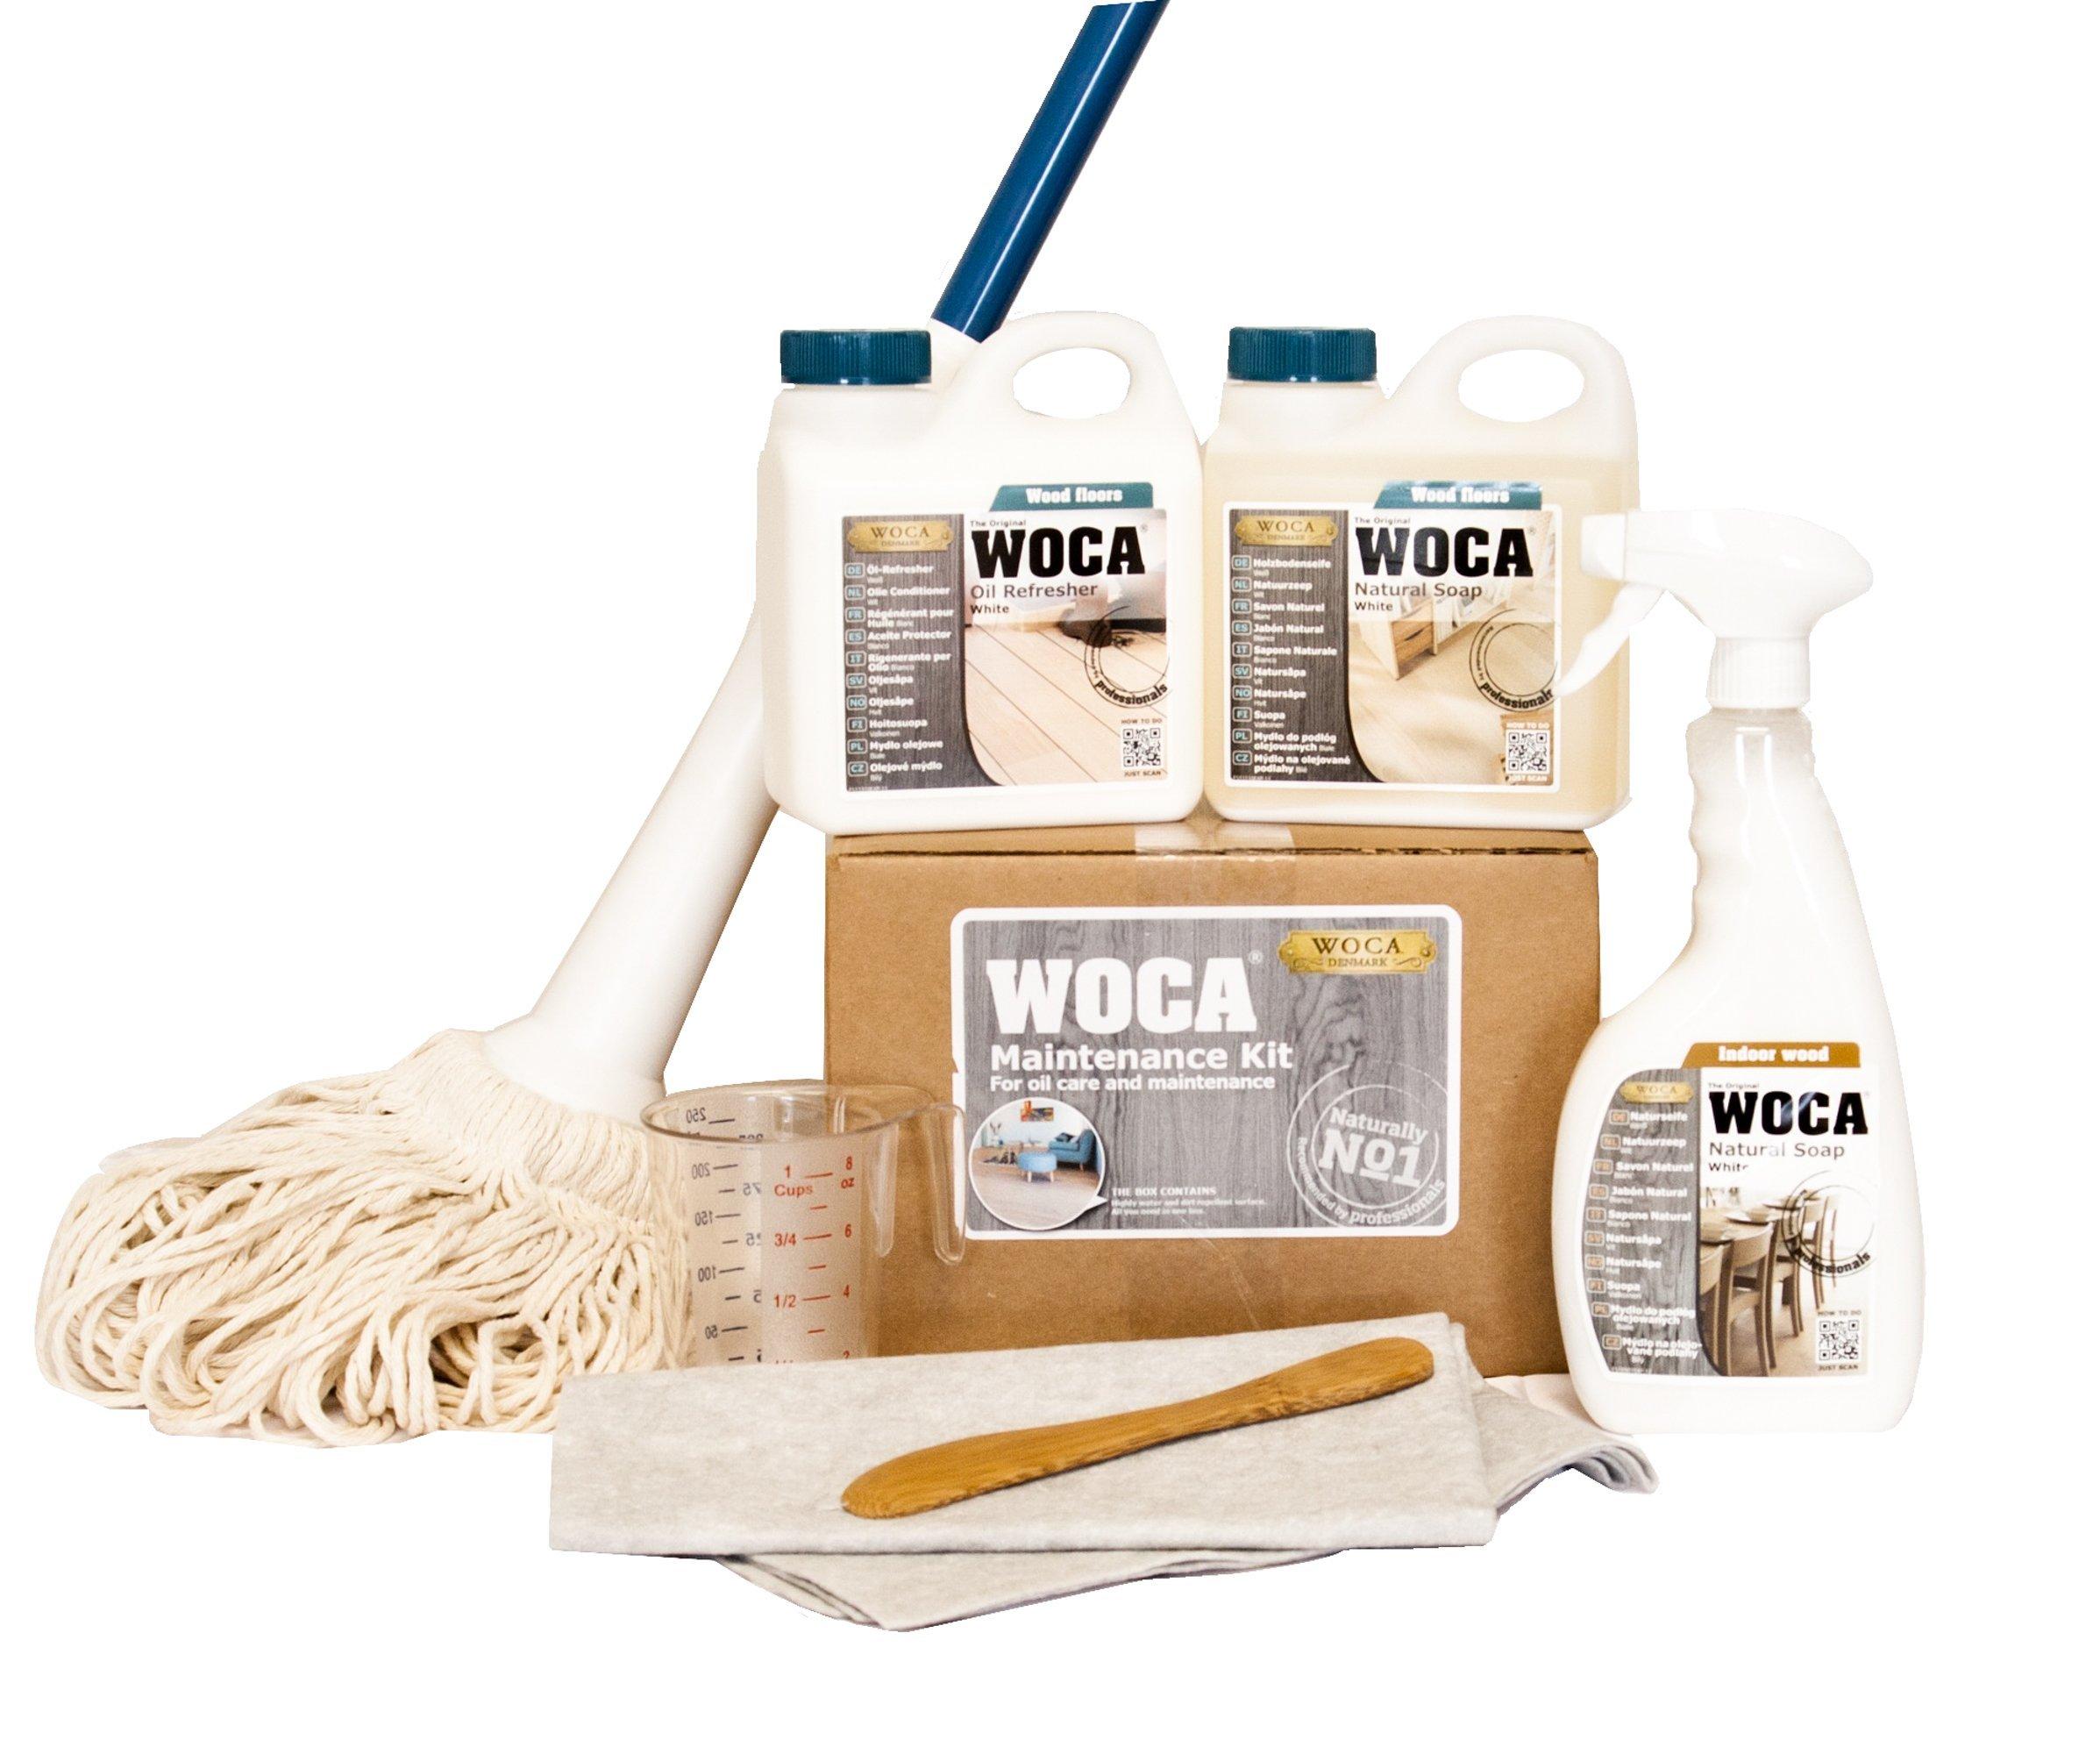 Woca Premiere Kit (White) by WOCA Denmark (Image #1)